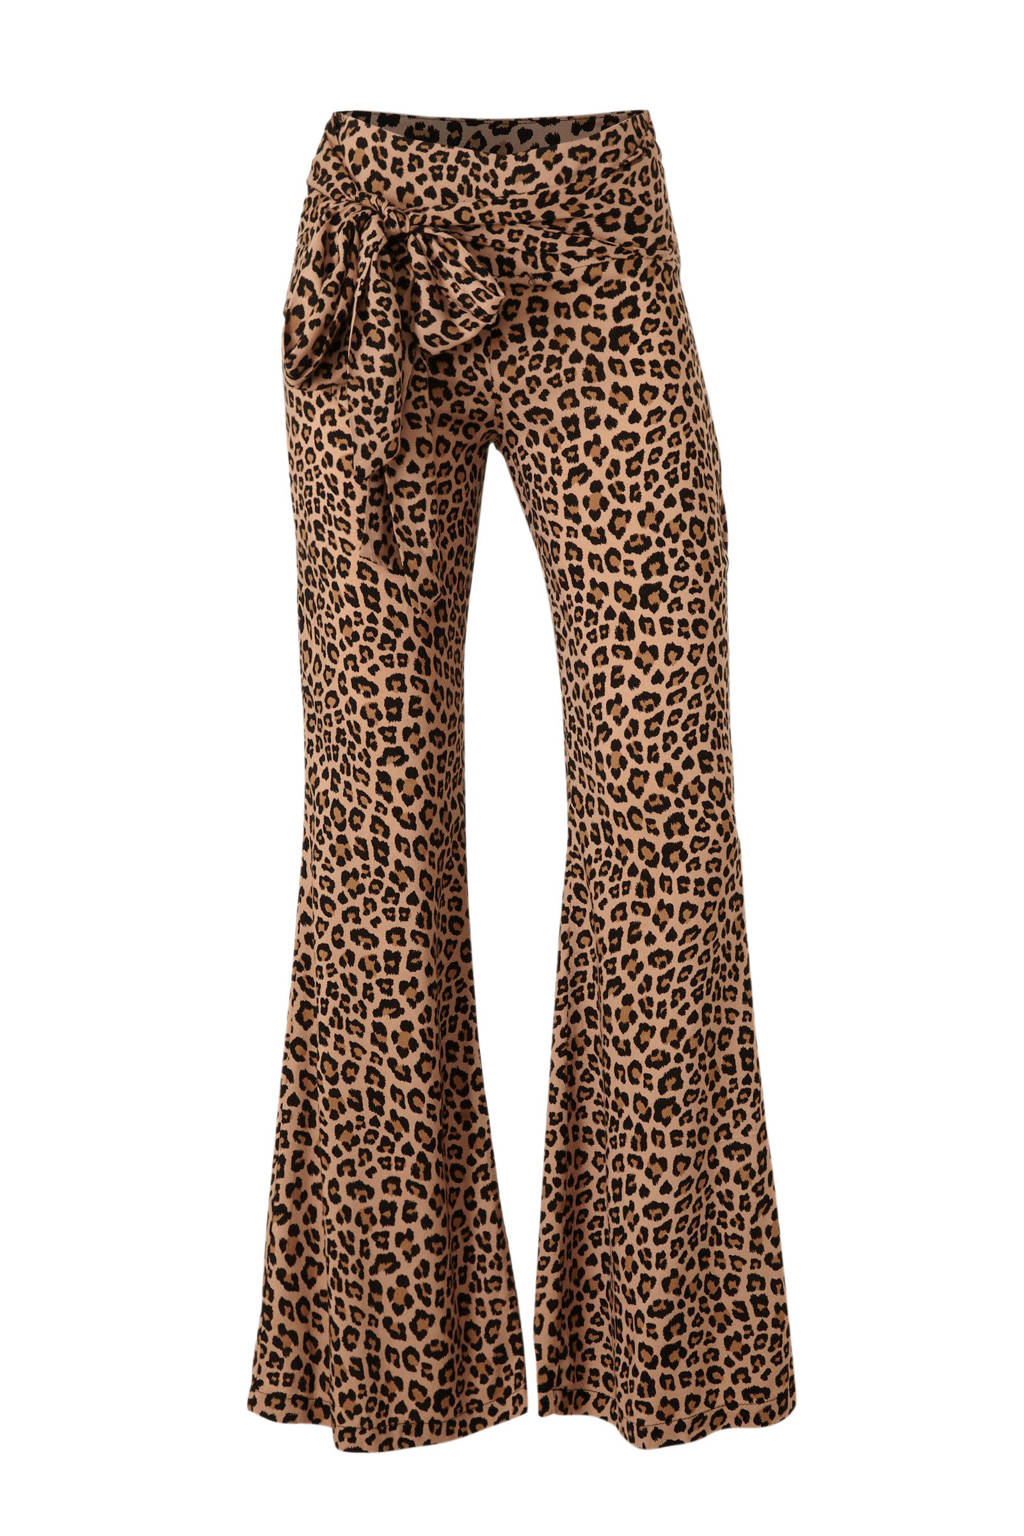 Colourful Rebel high waist flared palazzo broek met panterprint bruin/zwart, Bruin/zwart